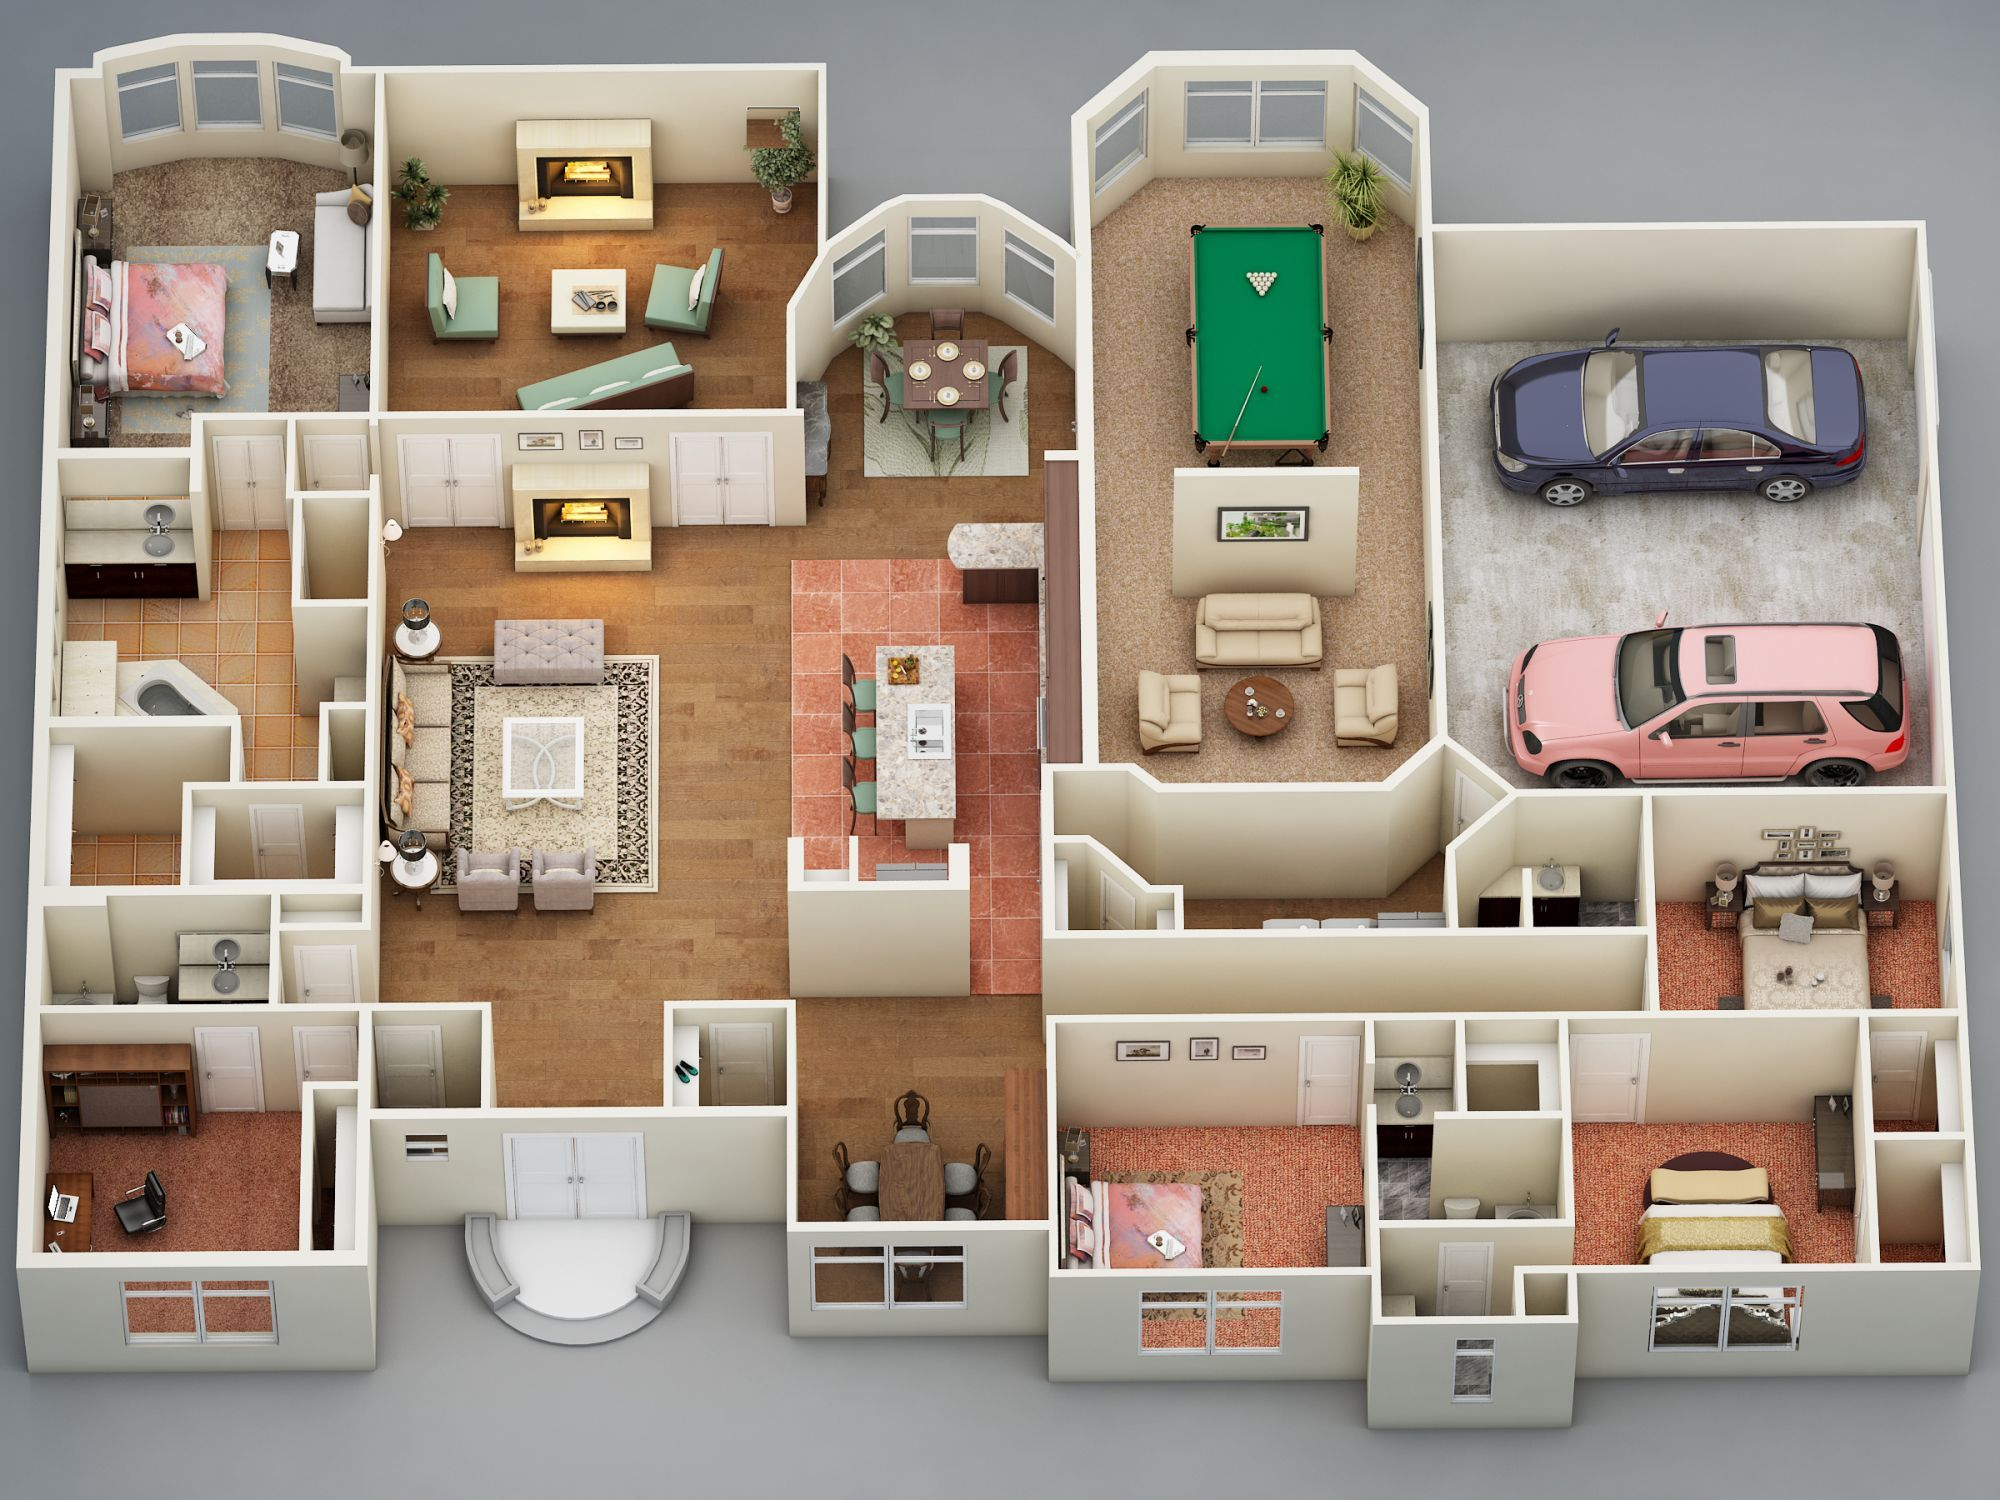 3d floor plan for townhouse haus pinterest for 3d raumgestaltung